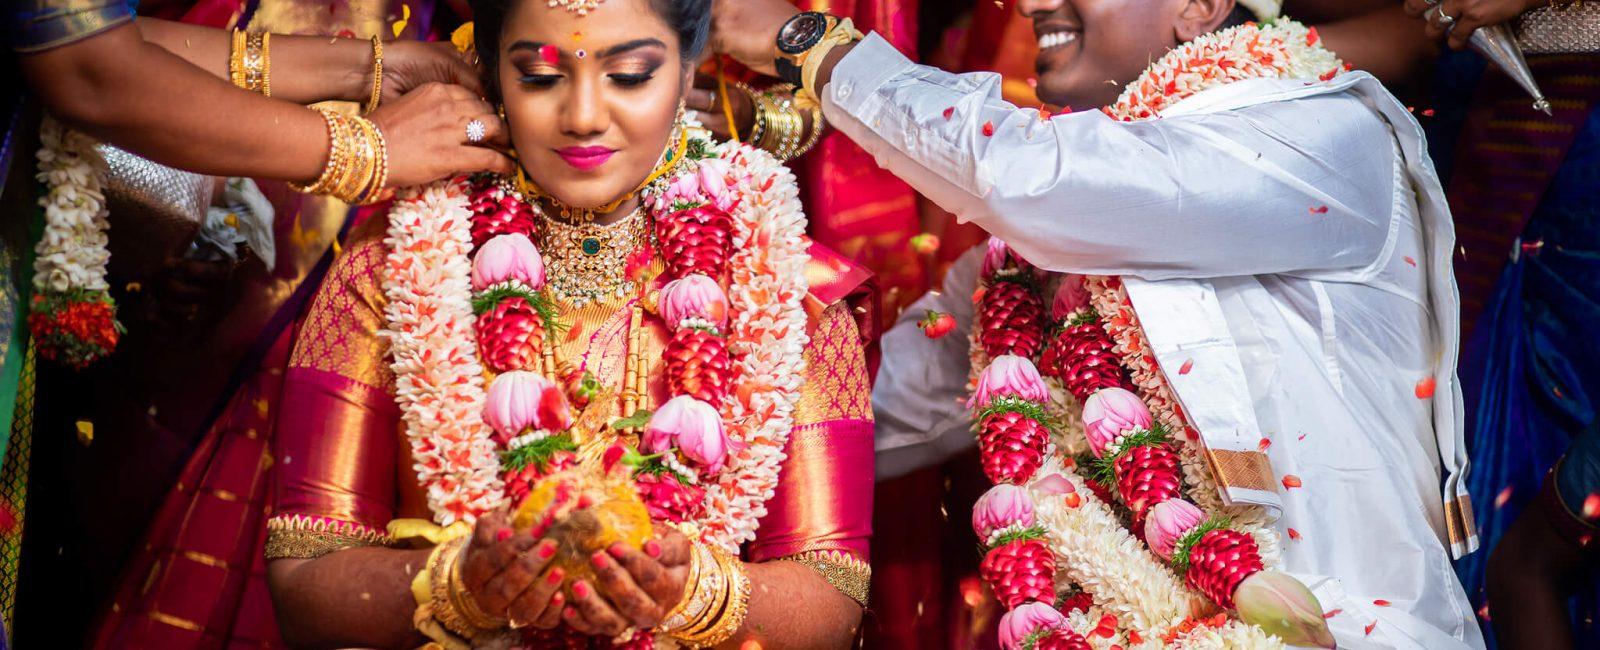 Chettinad Wedding   Lakshana & Vigneshwaran